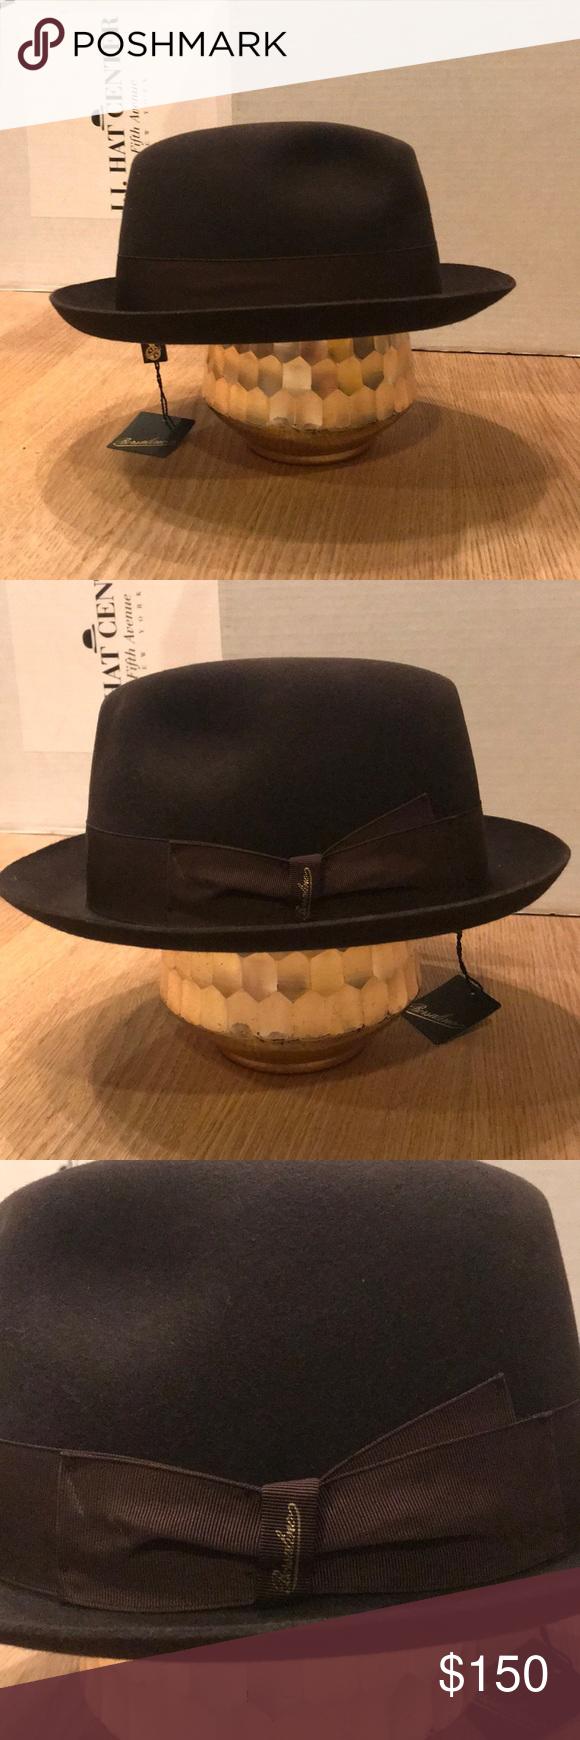 54209102dfa Borsalino Hats Usa - Parchment N Lead